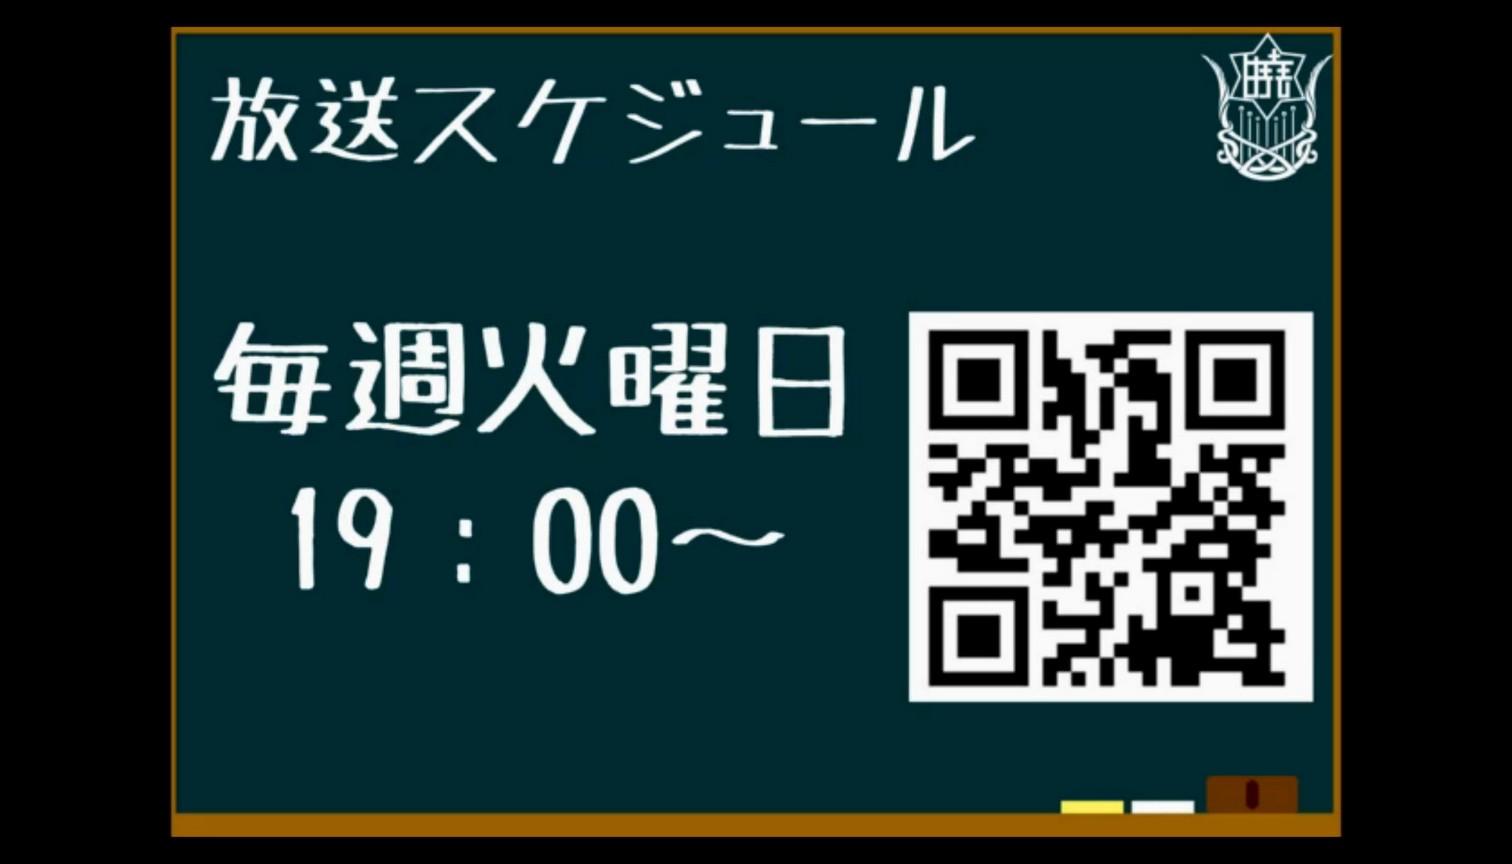 fow-live-180313-001.jpg